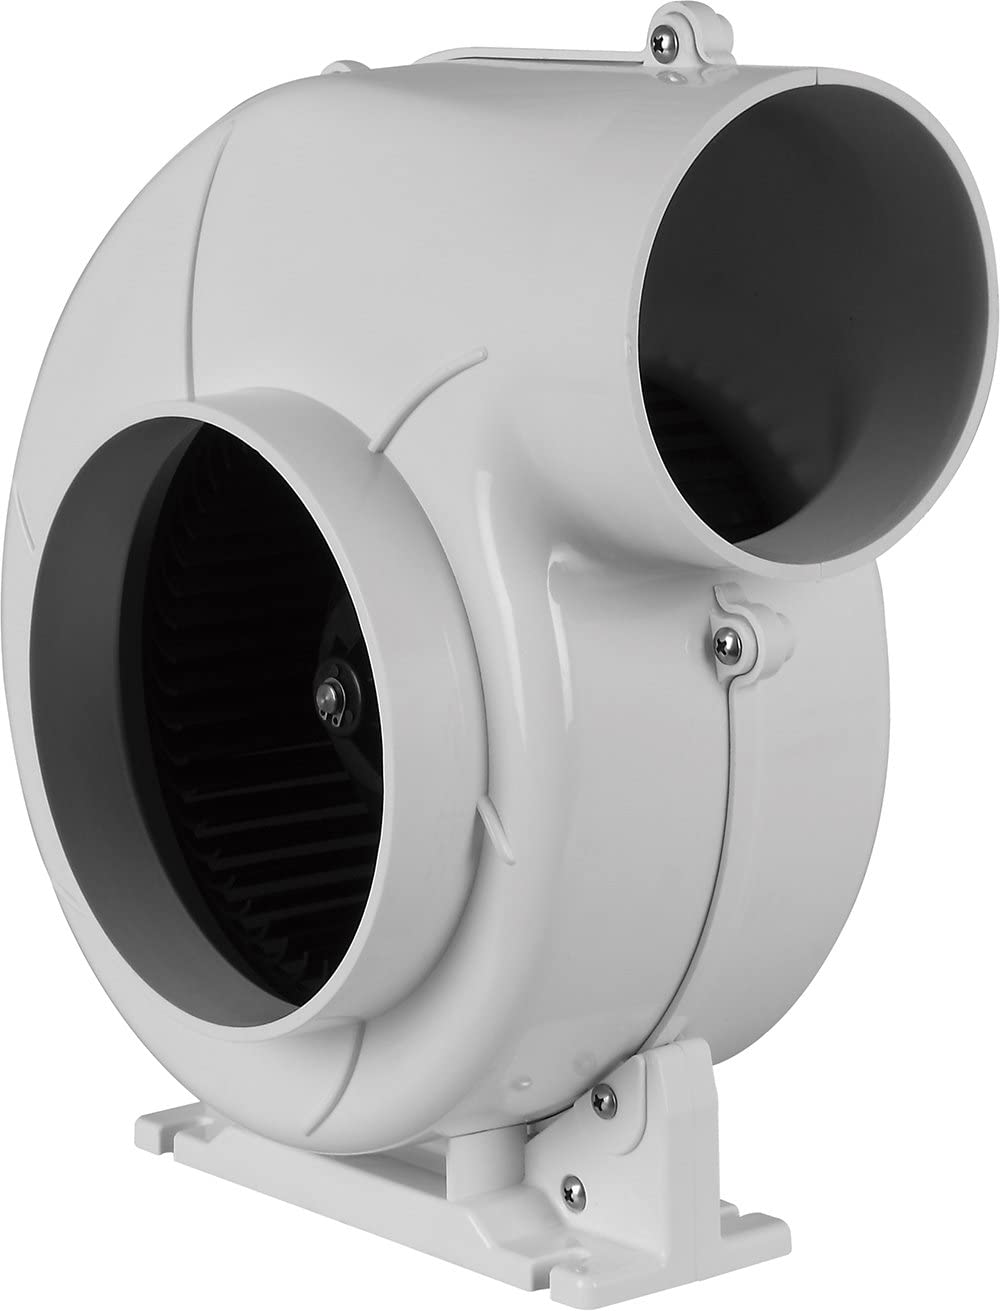 Seaflo High Flow Blower Fan, 320 CFM 12 Volt